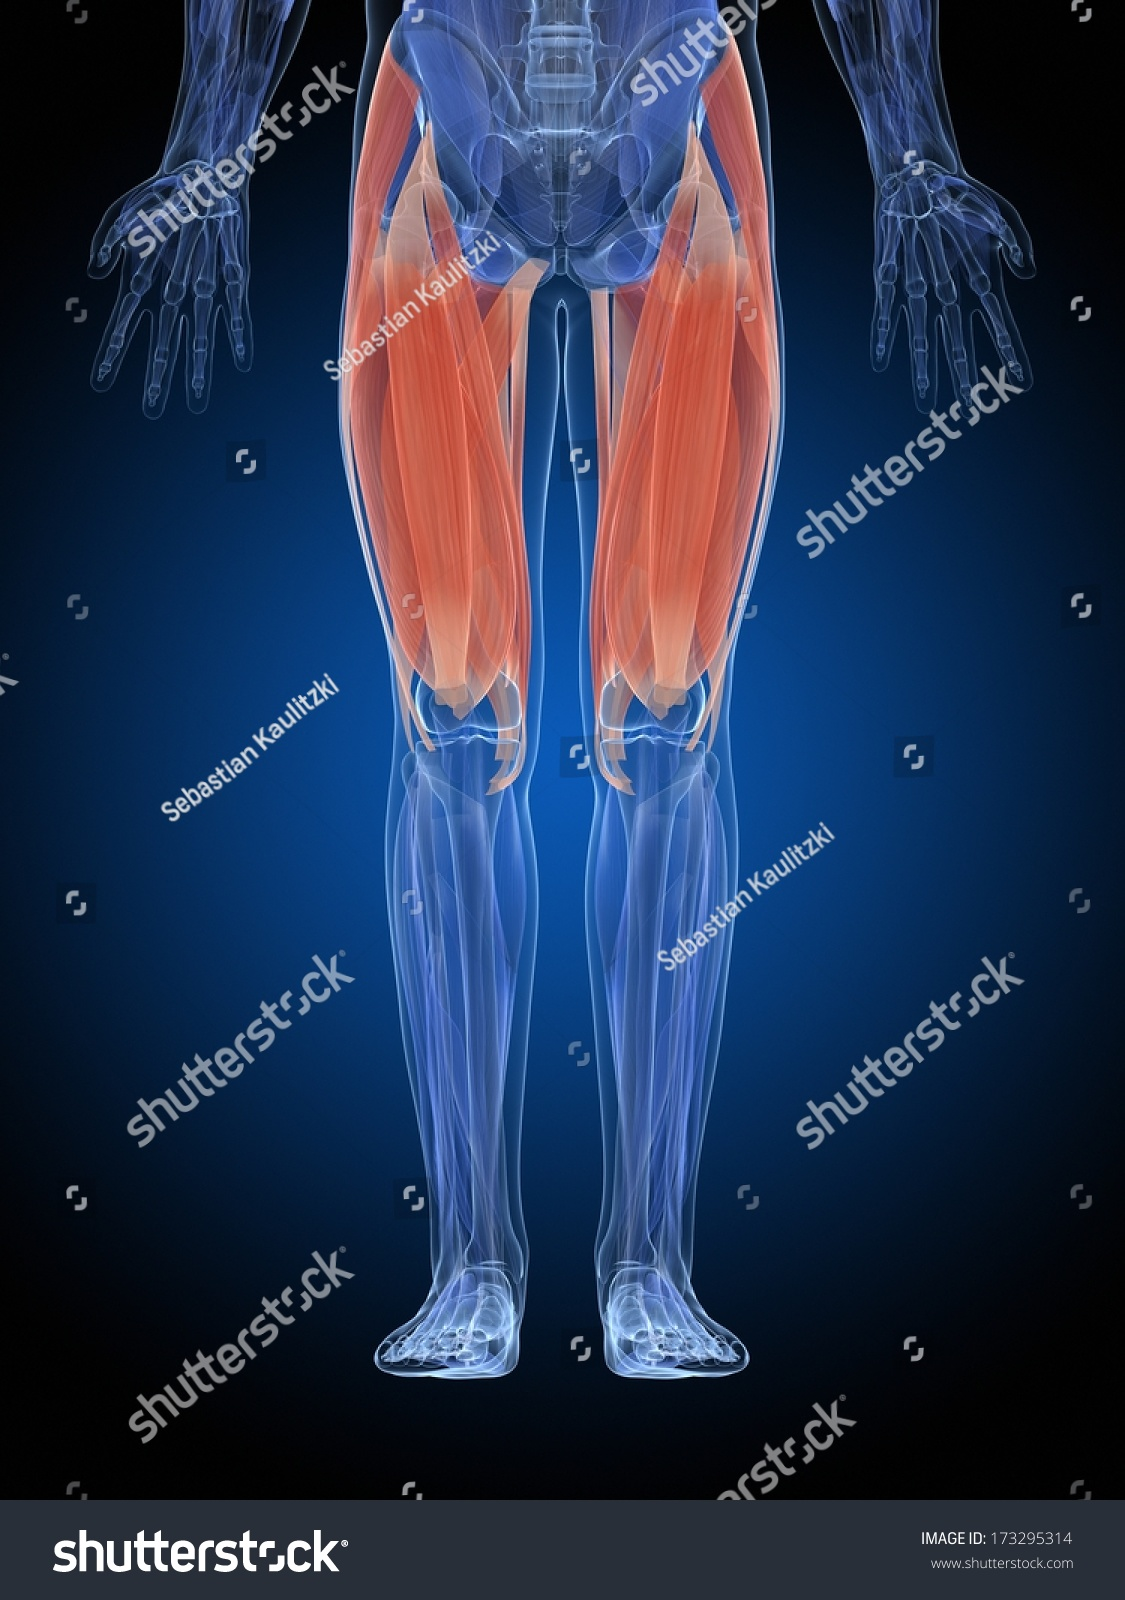 Royalty Free Stock Illustration Of Medical Illustration Upper Leg